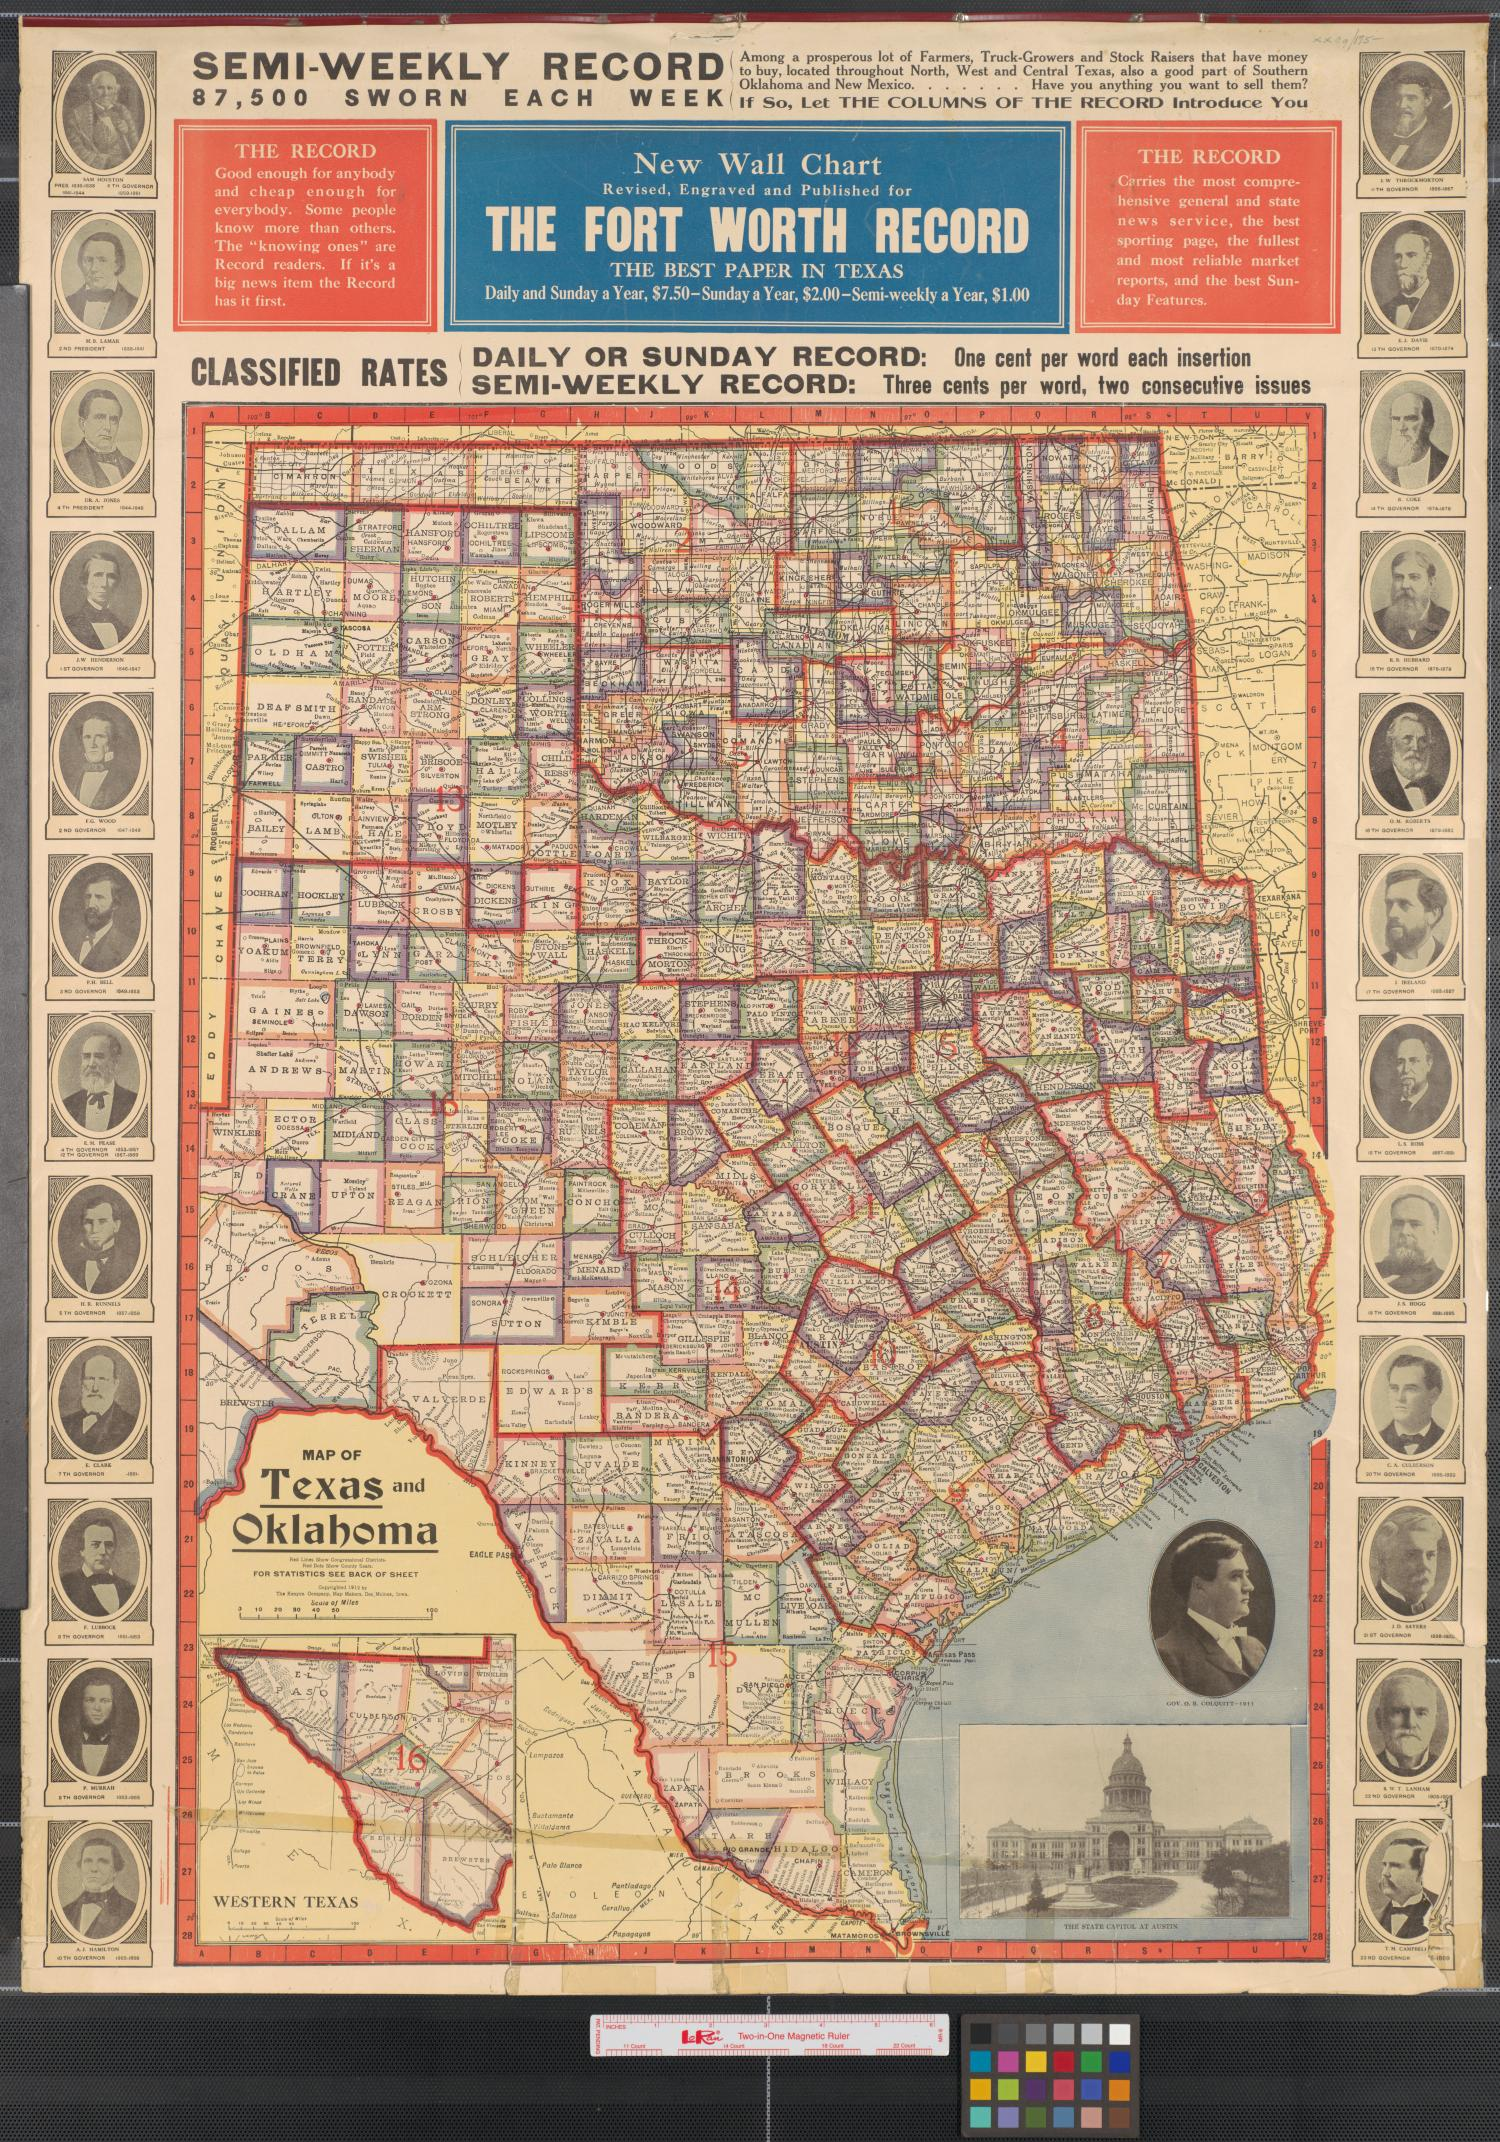 Map Of North Texas And Oklahoma.Map Of Texas And Oklahoma The Portal To Texas History